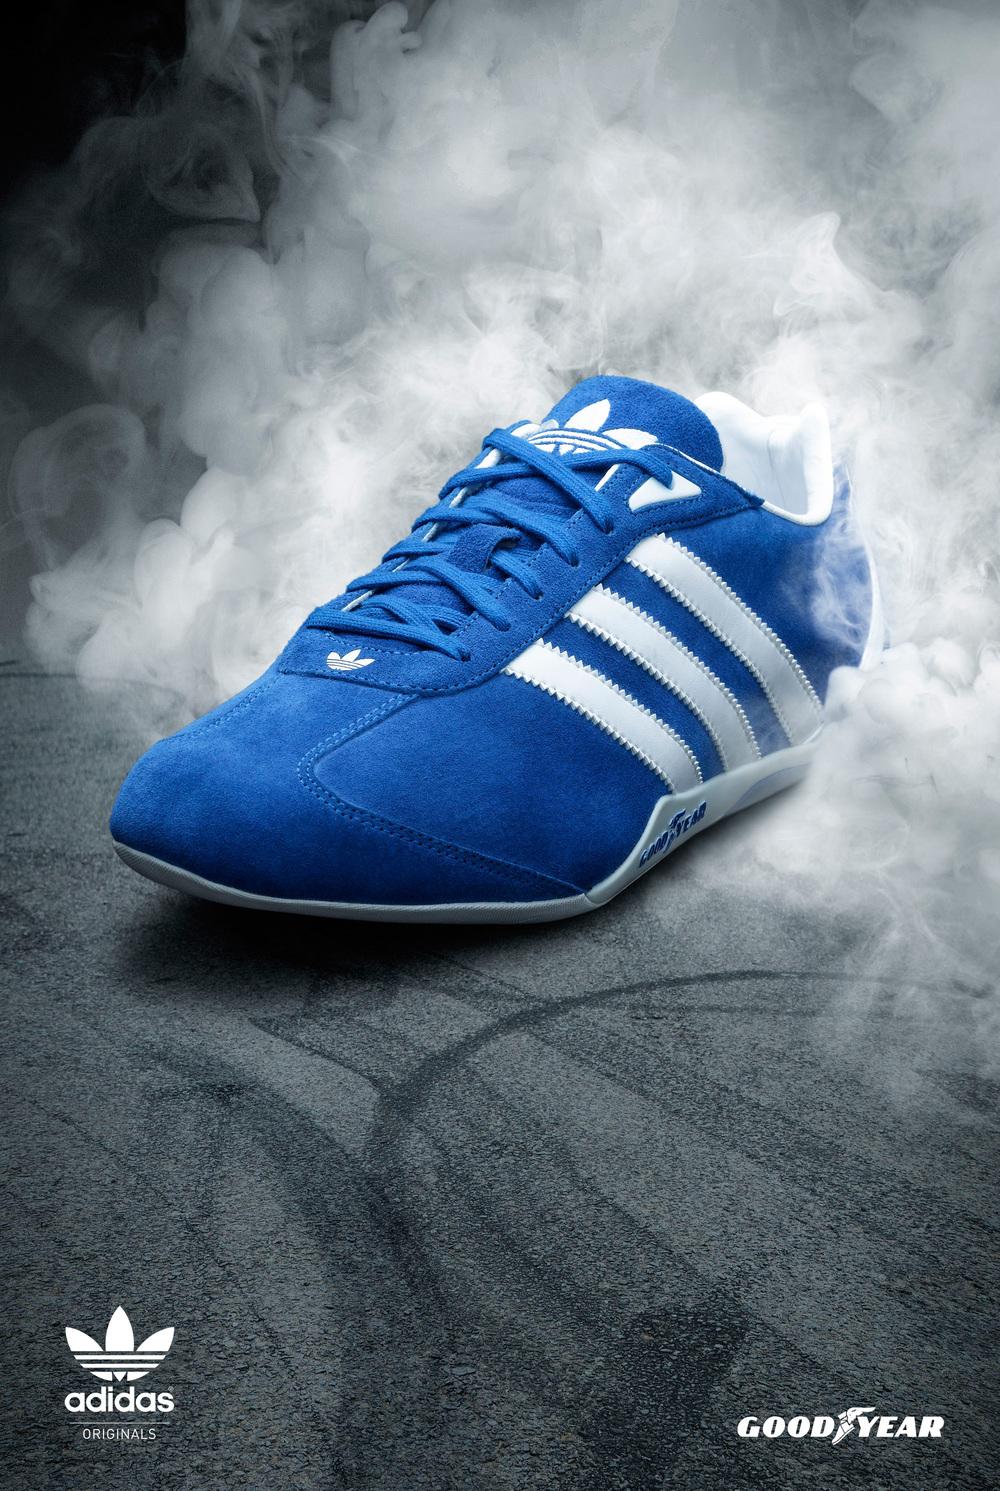 Adidas-Goodyear-2.jpg